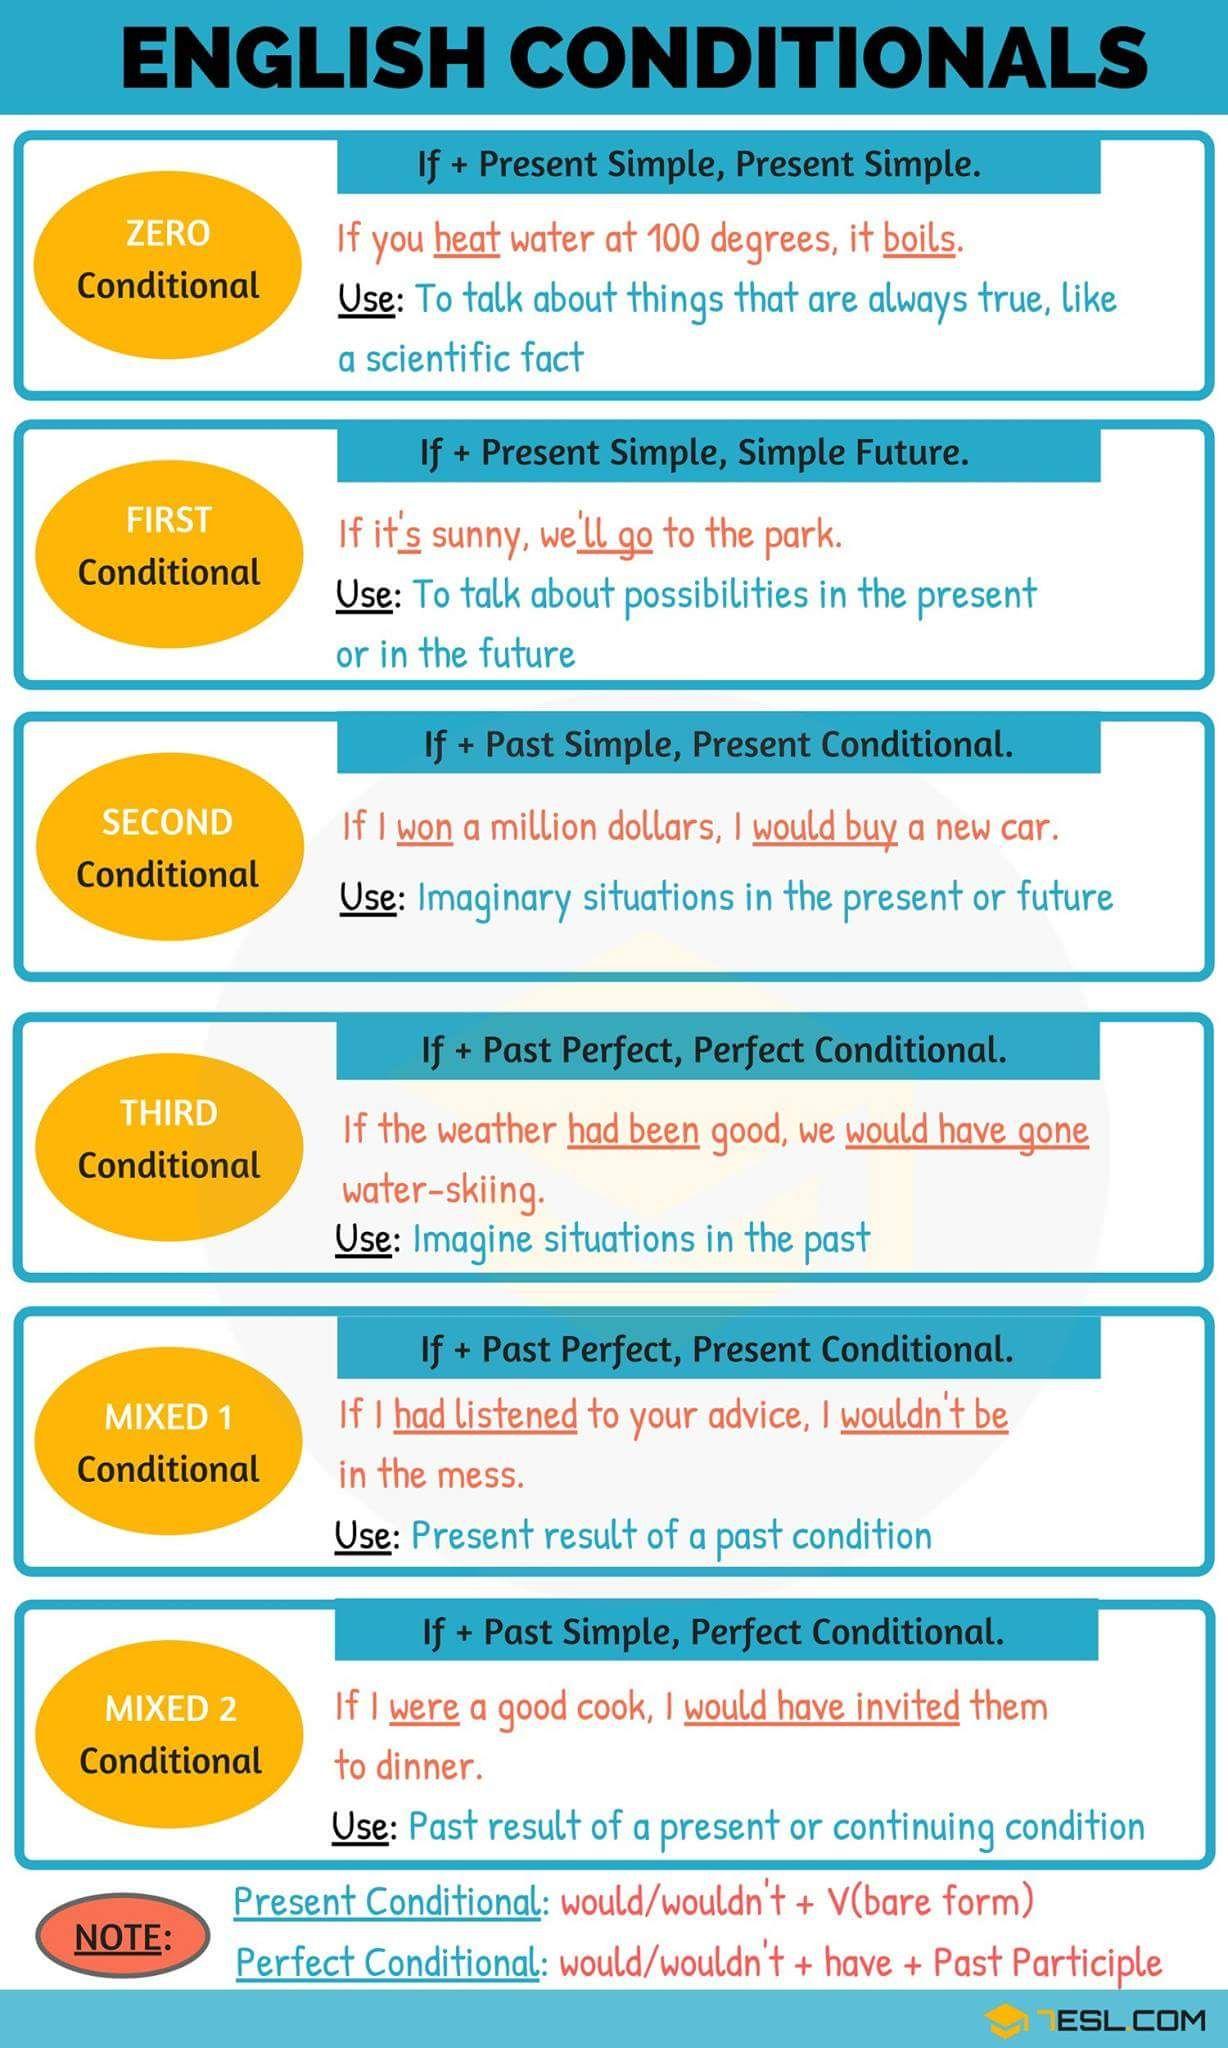 English Conditionals English Grammar 7esl Langues Idiomas